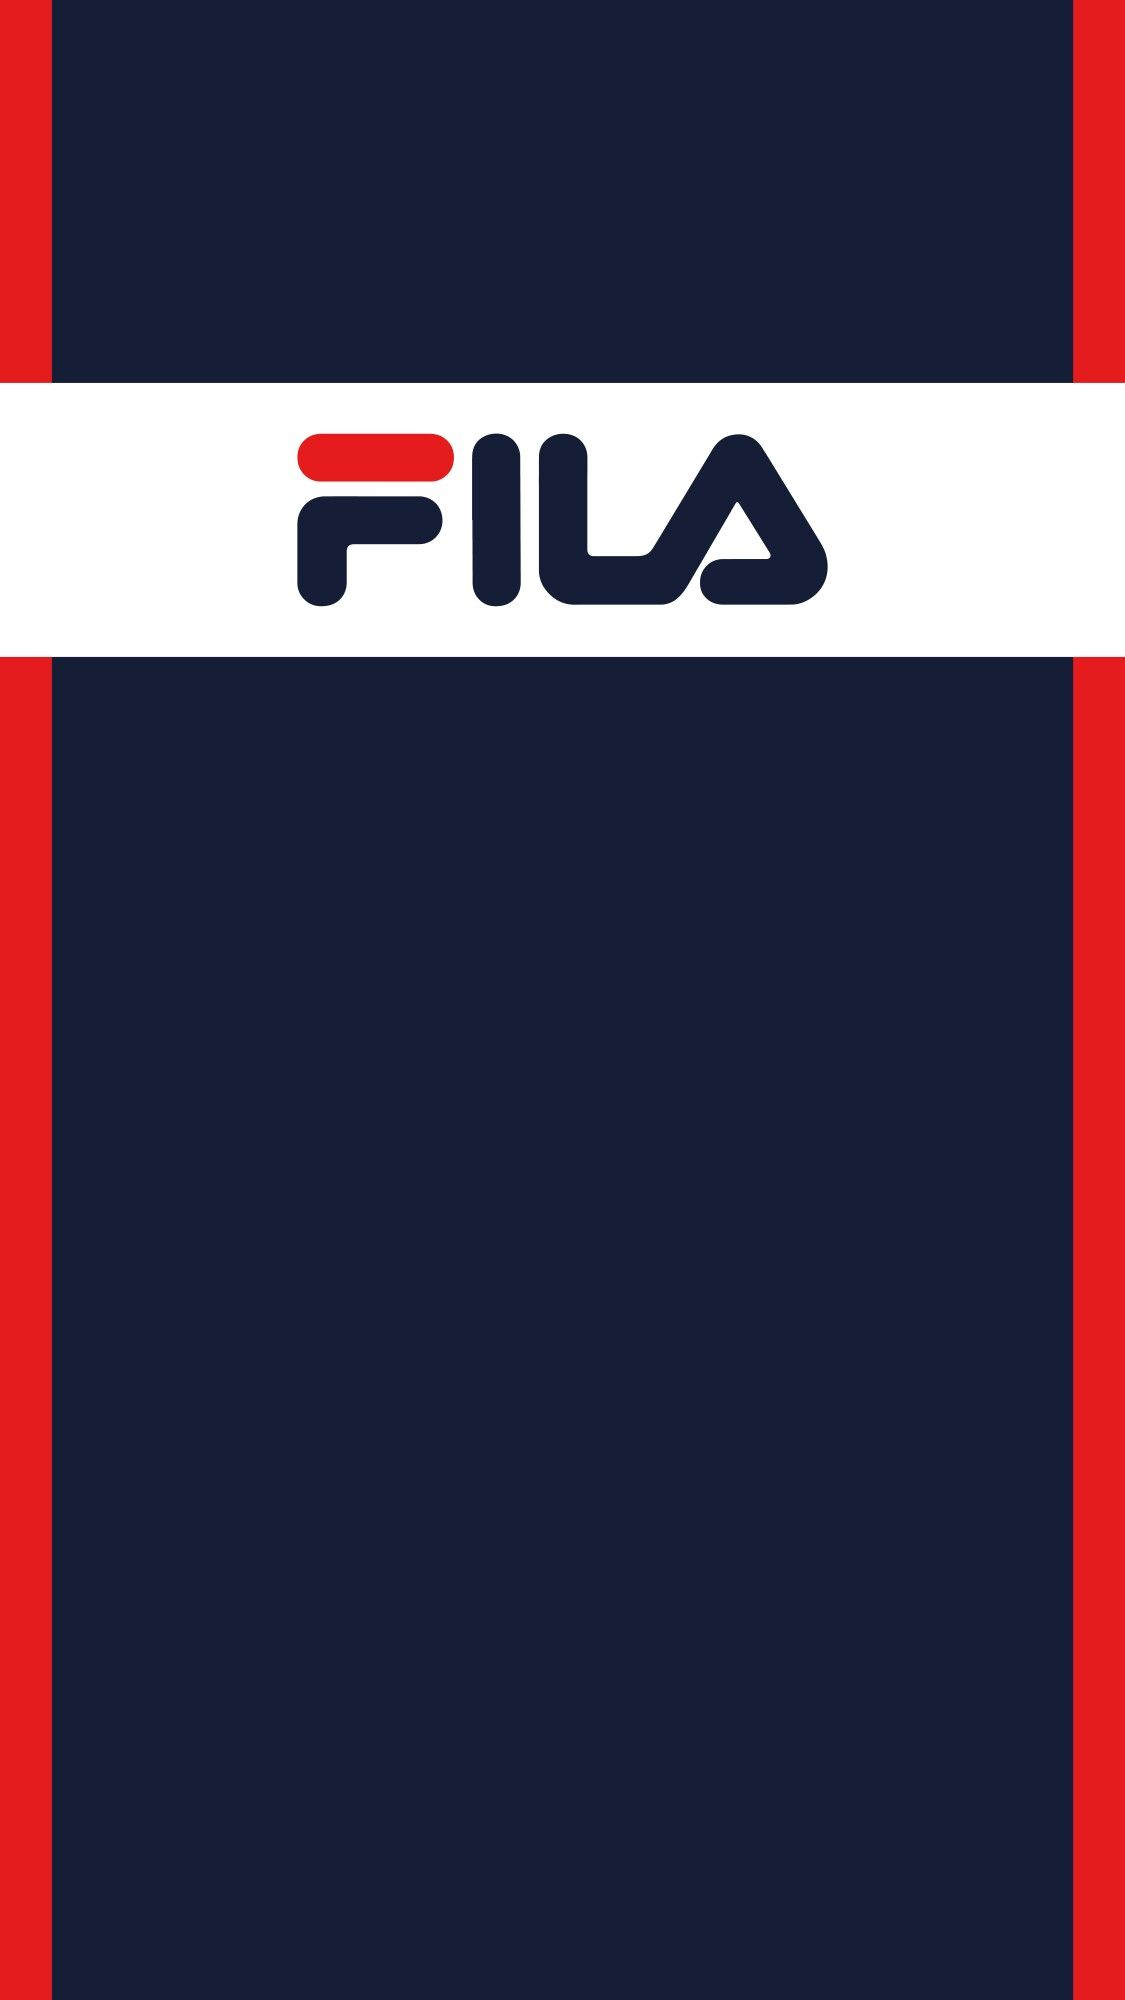 Backgrounds Fila Fond D Ecran Telephone Fond Iphone Fond D